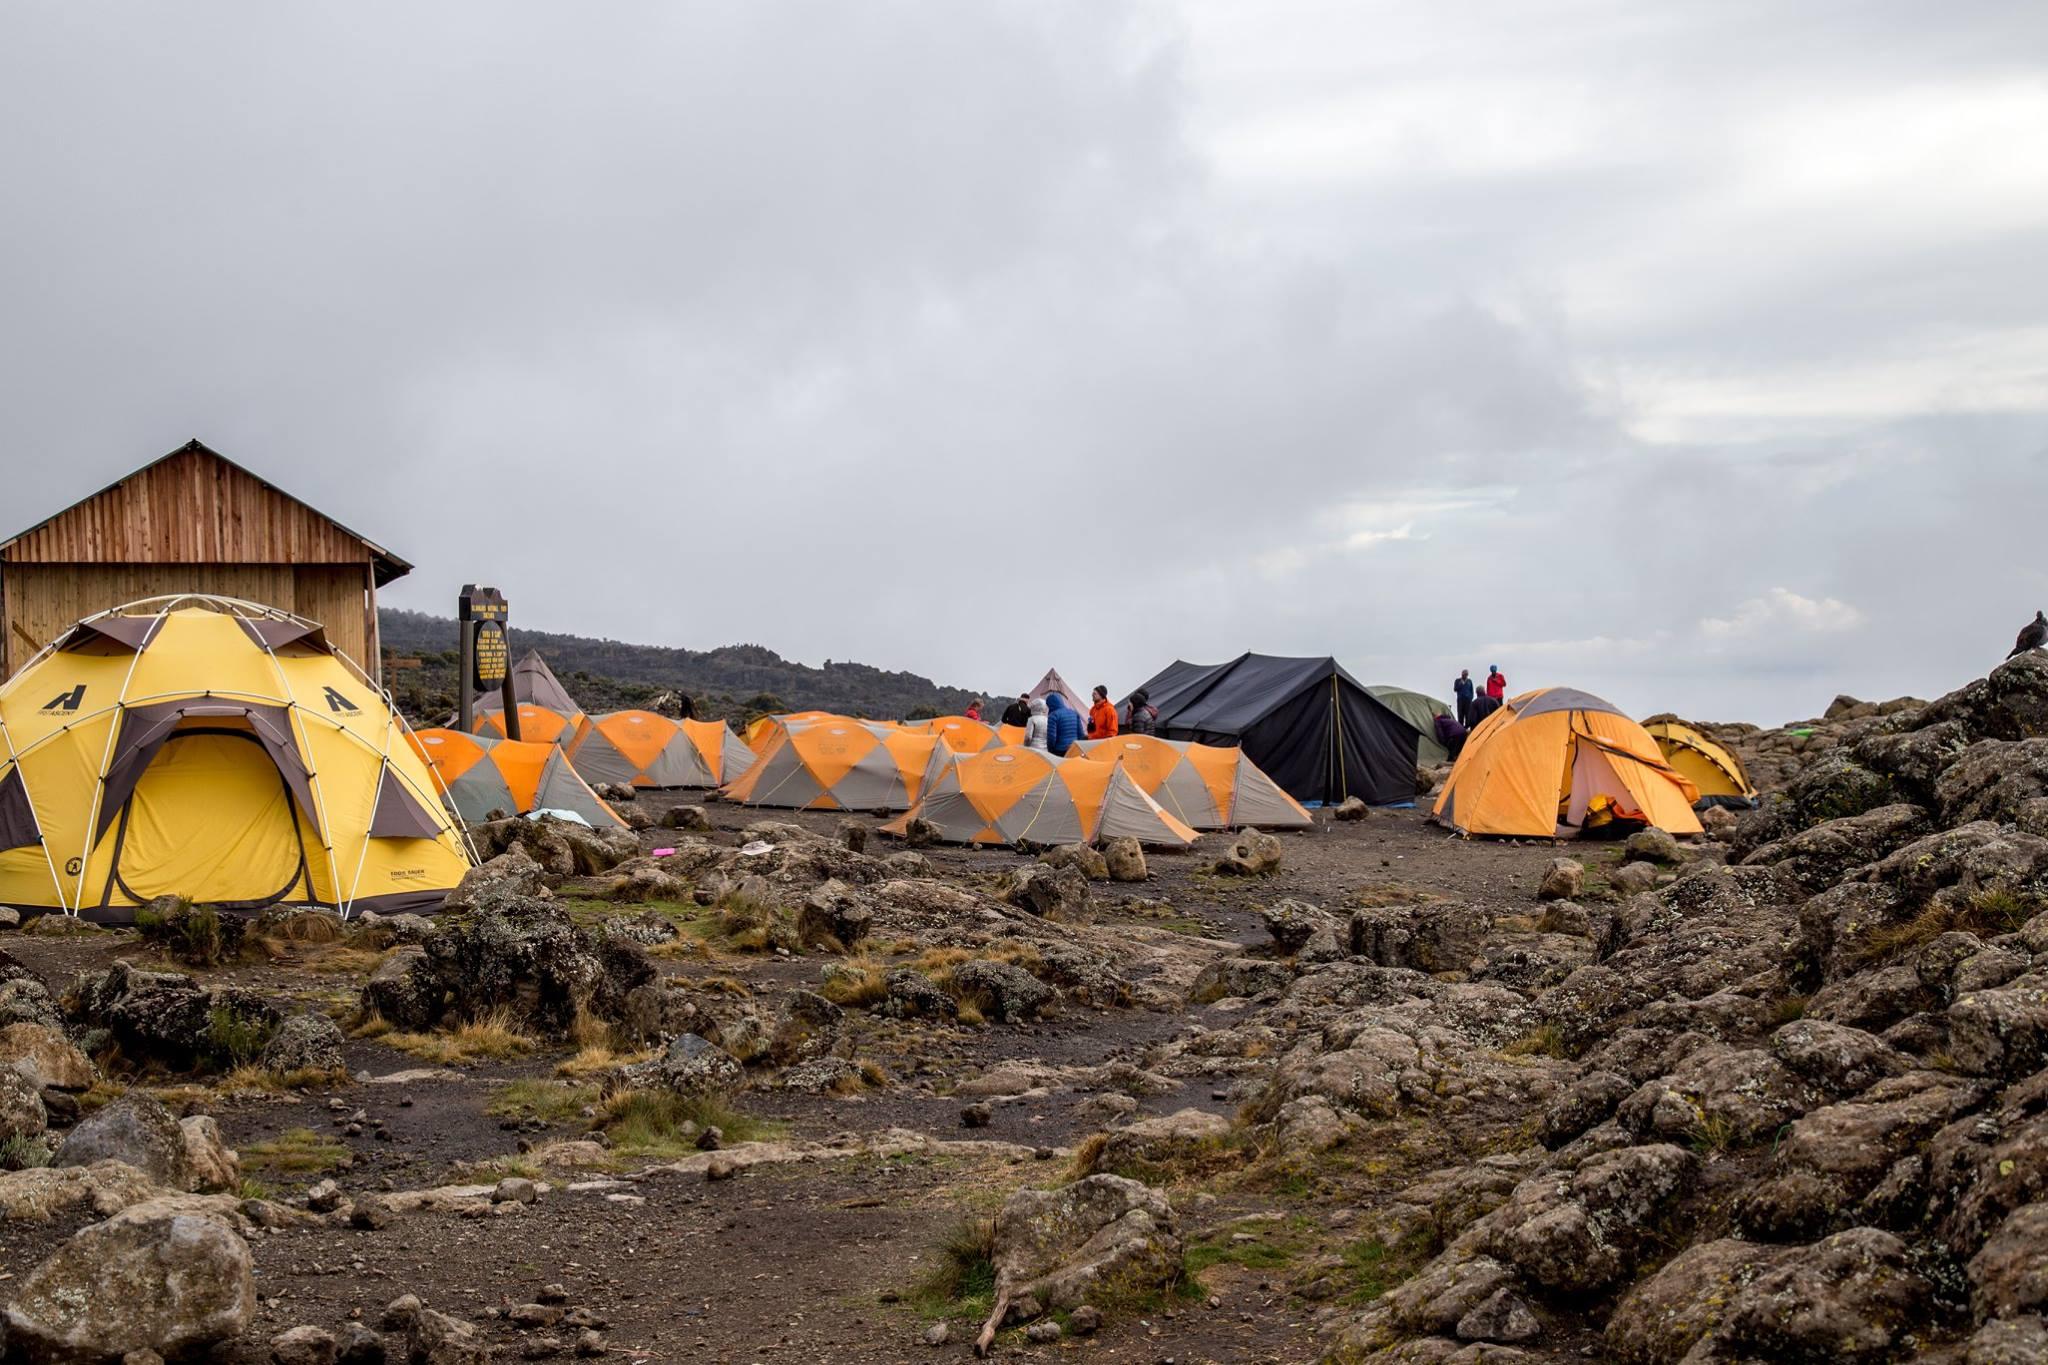 Kilimanjaro Base Camp